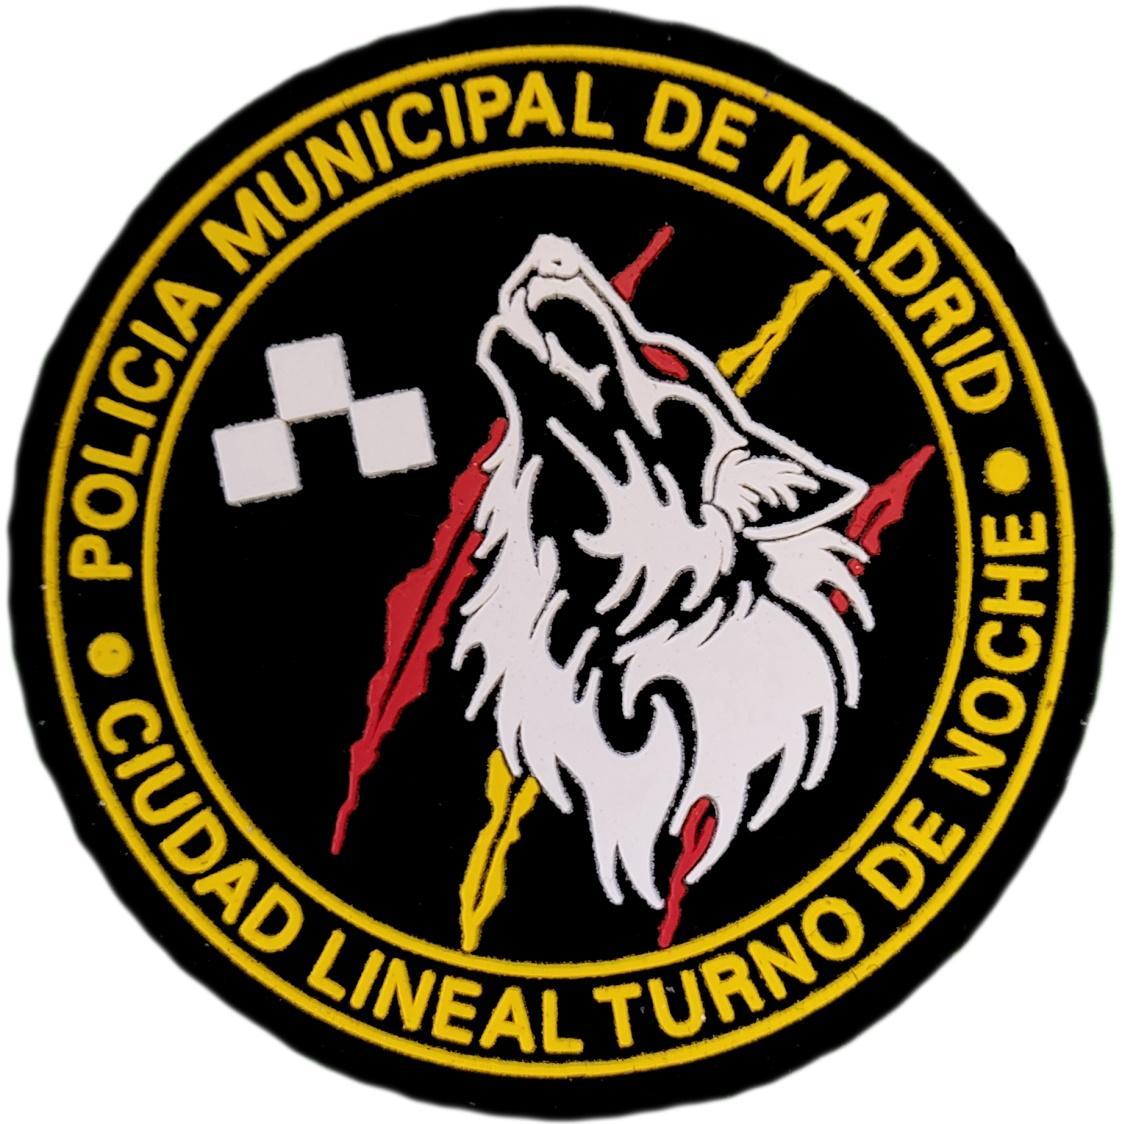 Policía Municipal Madrid Distrito Ciudad Lineal Turno Noche parche insignia emblema distintivo